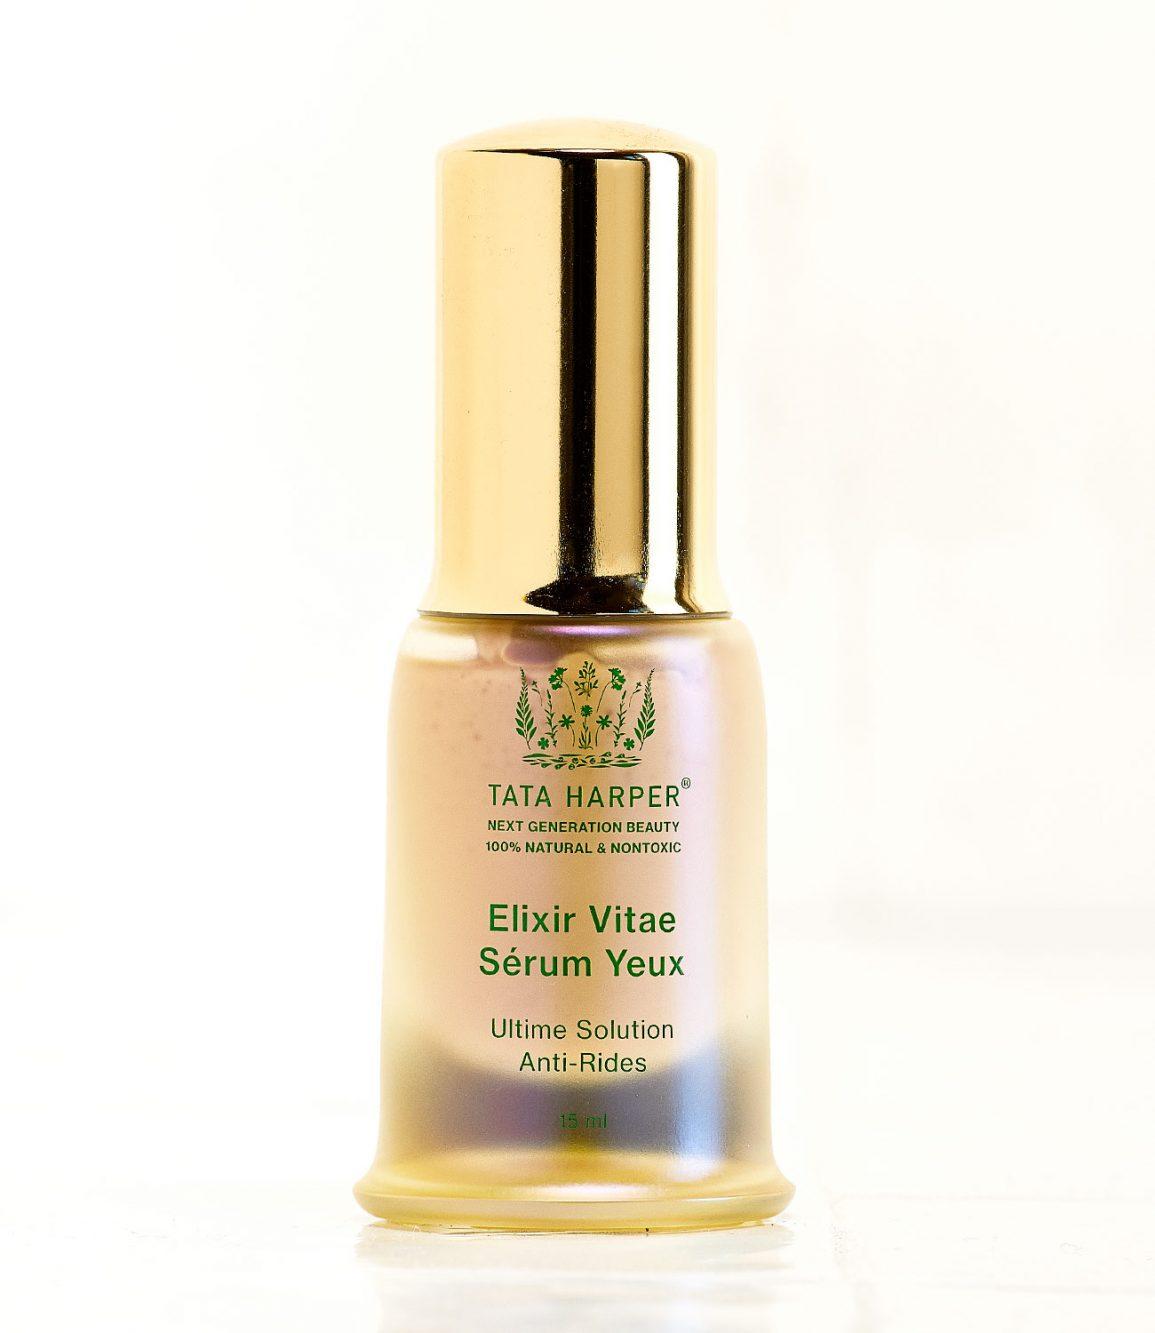 Elixir Vitae serum yeux par Tata Harper